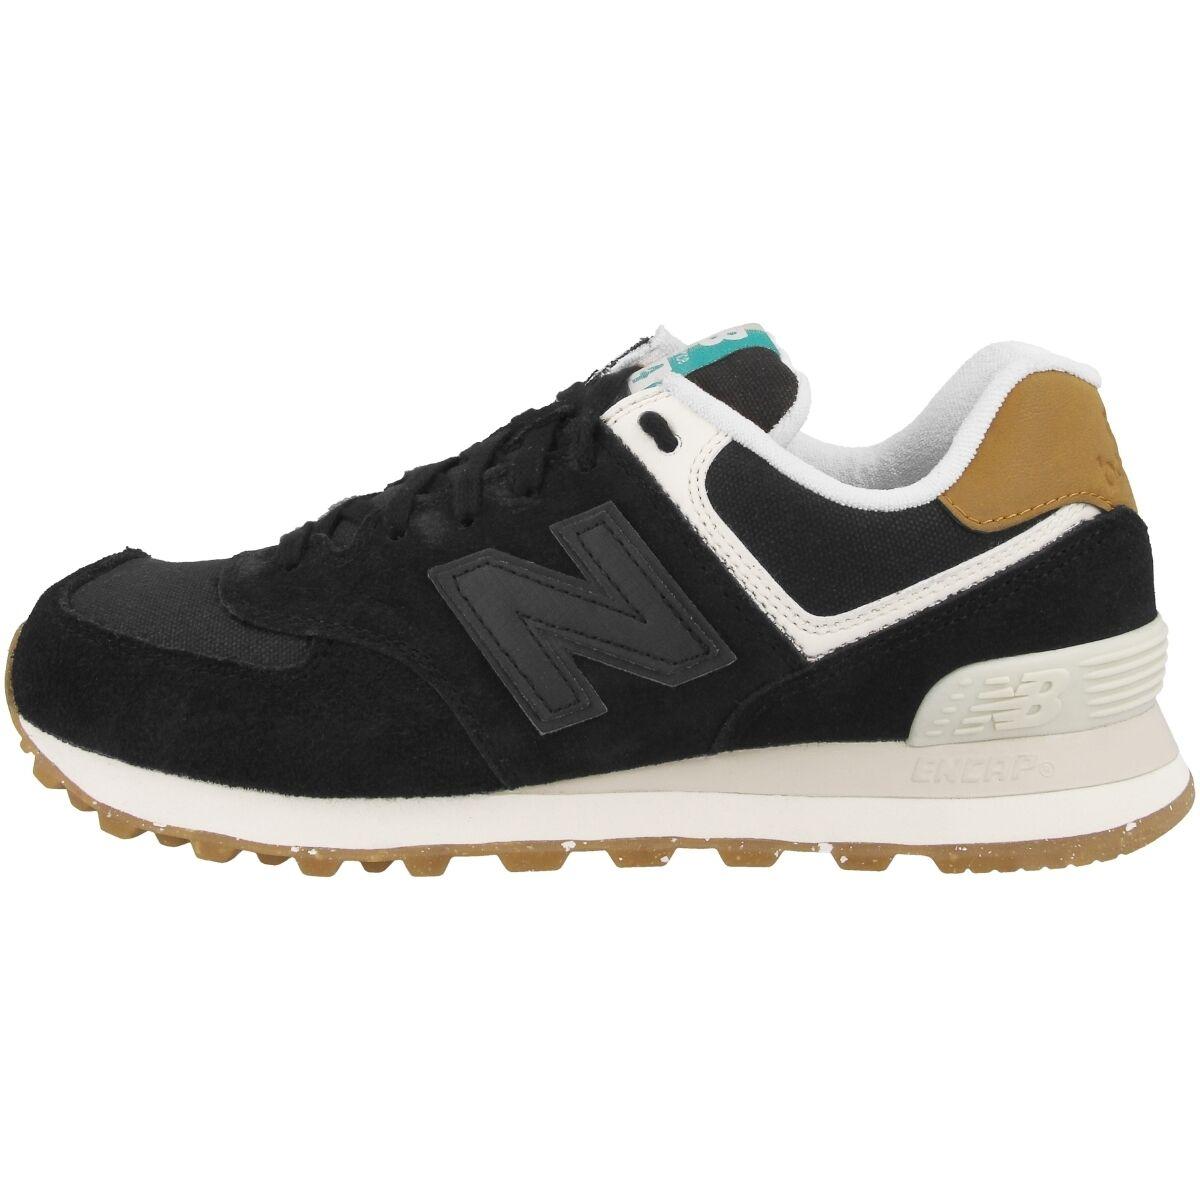 New Damen Balance WL 574 SEC Women Schuhe black powder Damen New Sneaker ML 410 WL574SEC f65025